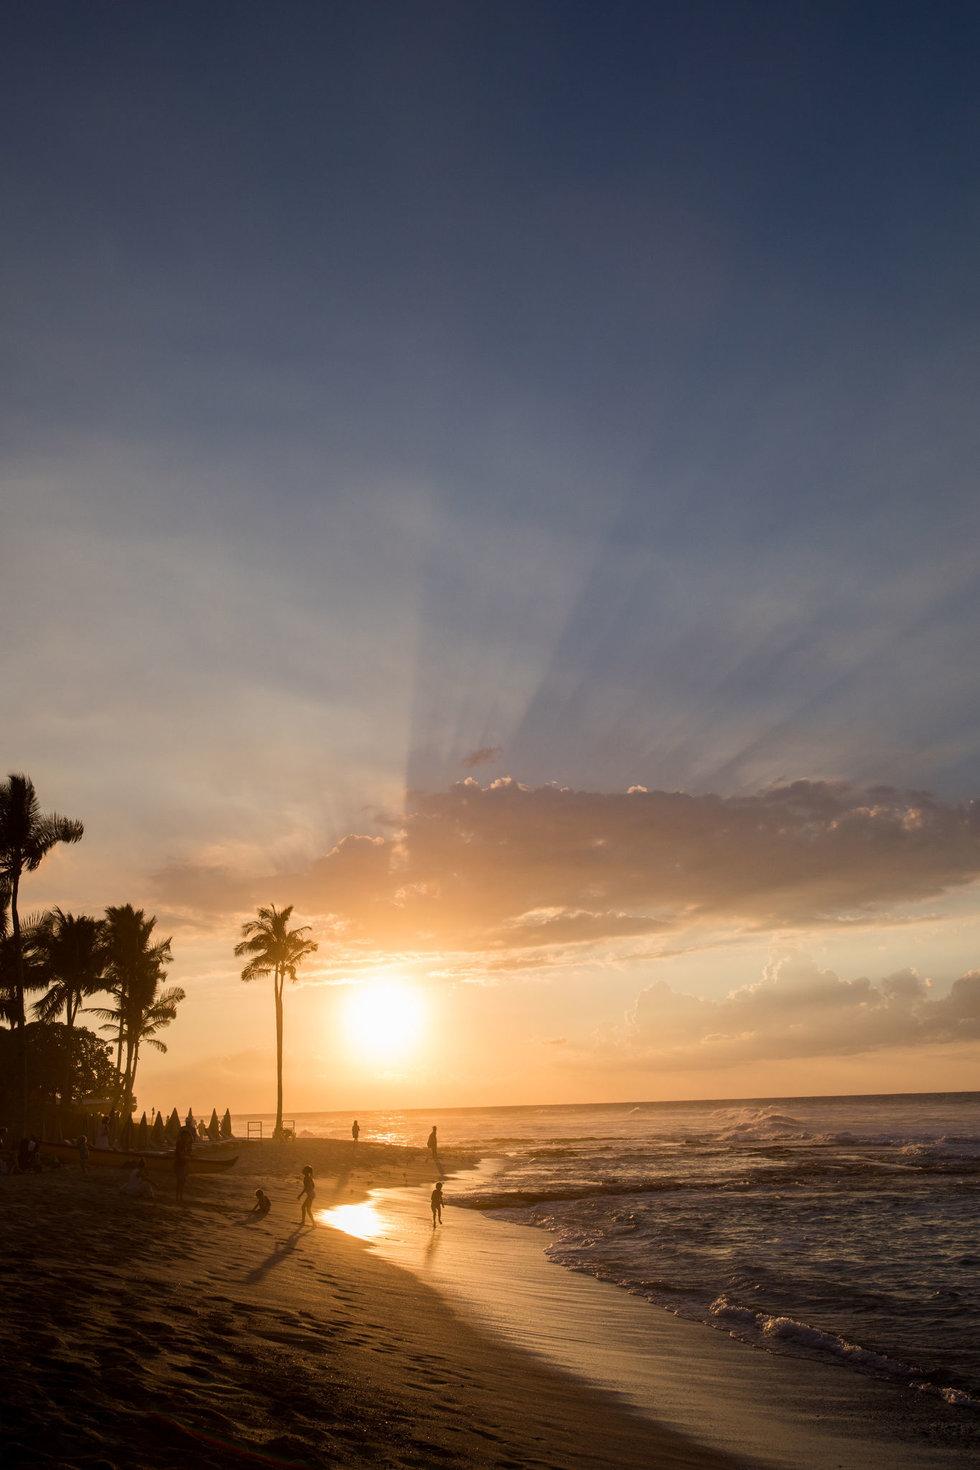 Sunset at the Four Seasons Resort Hualalai